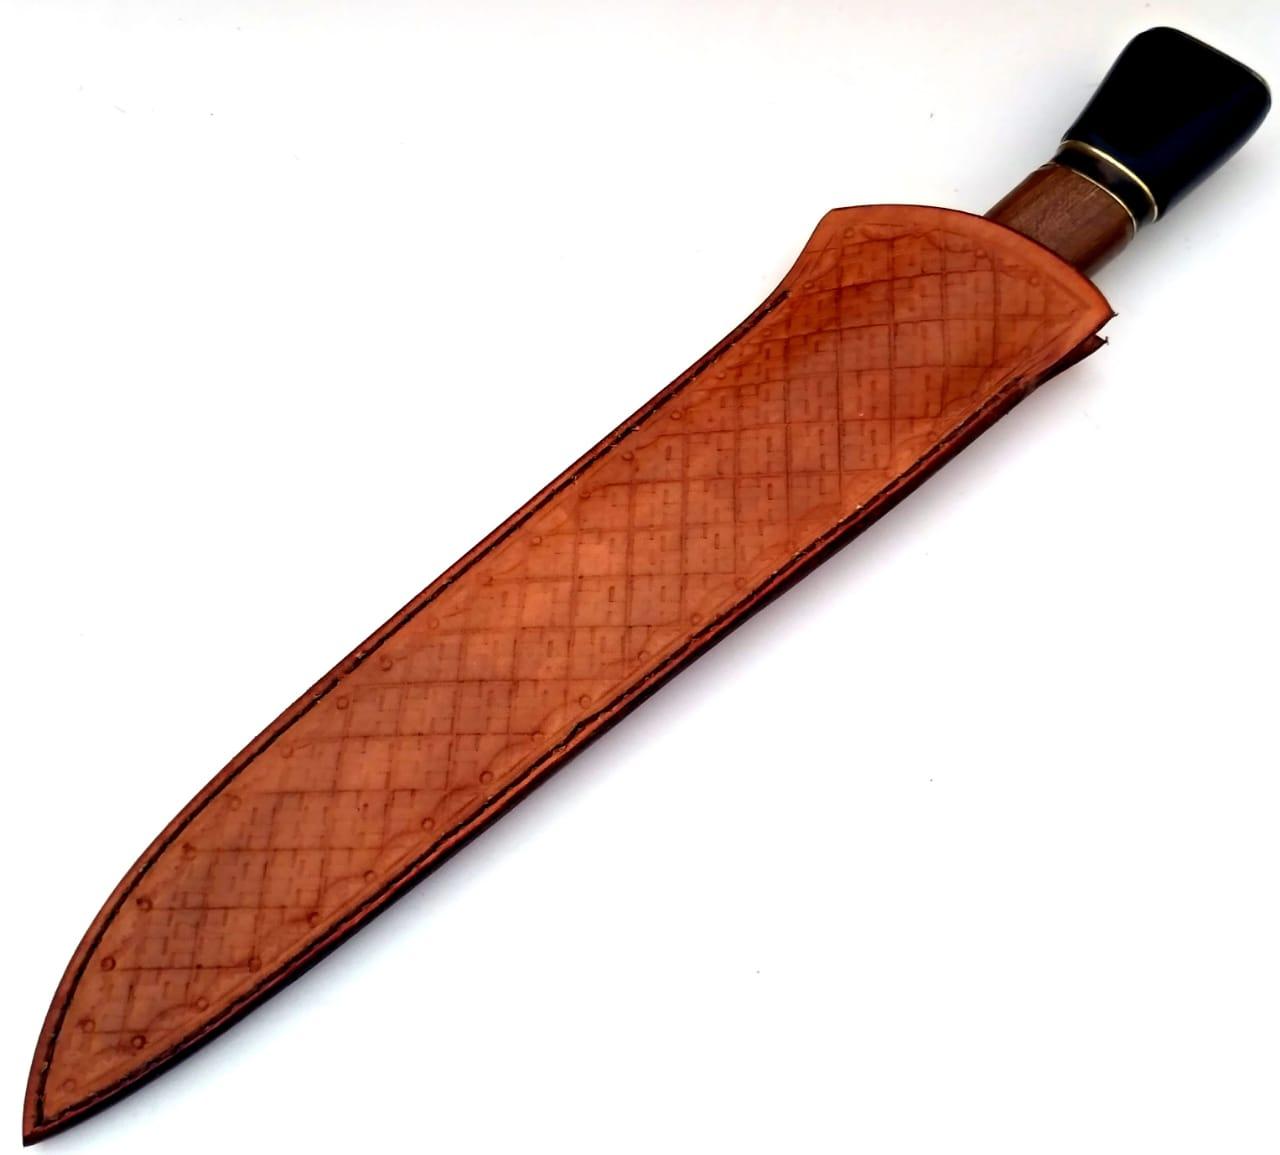 Faca artesanal campeira gaúcha integral aço inox 10 polegadas